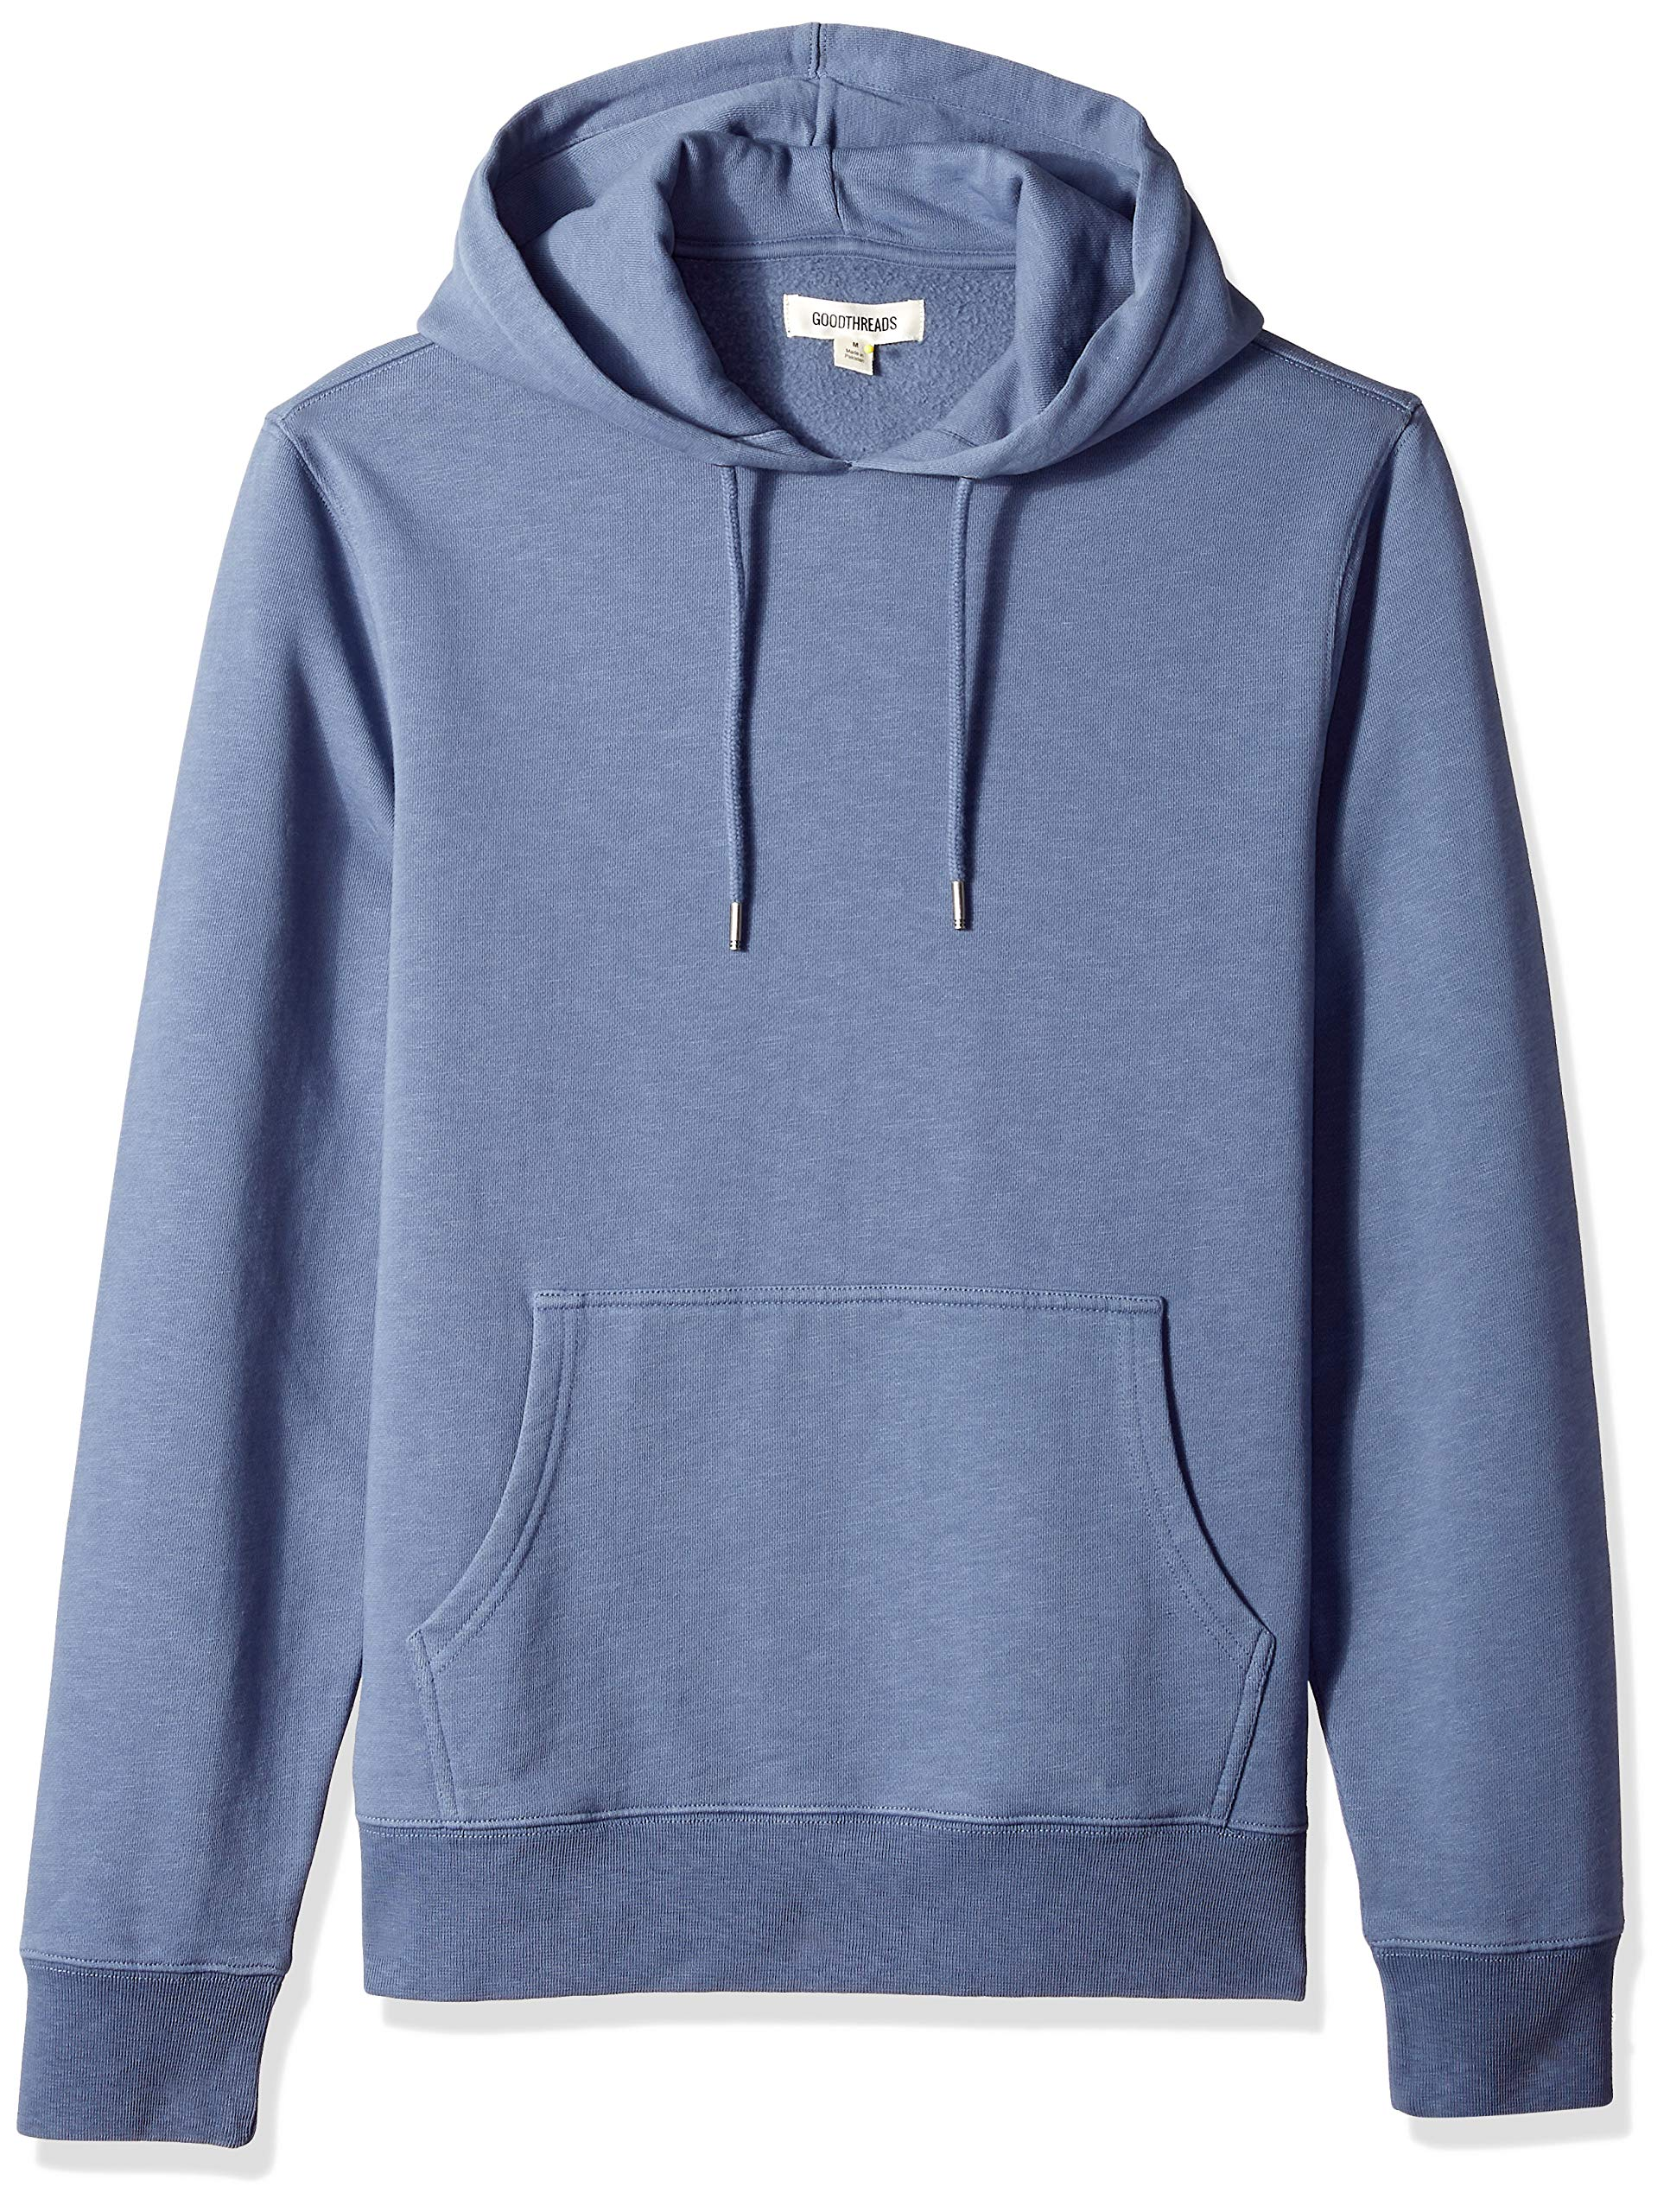 Goodthreads Men's Pullover Fleece Hoodie, Vintage Indigo, Medium